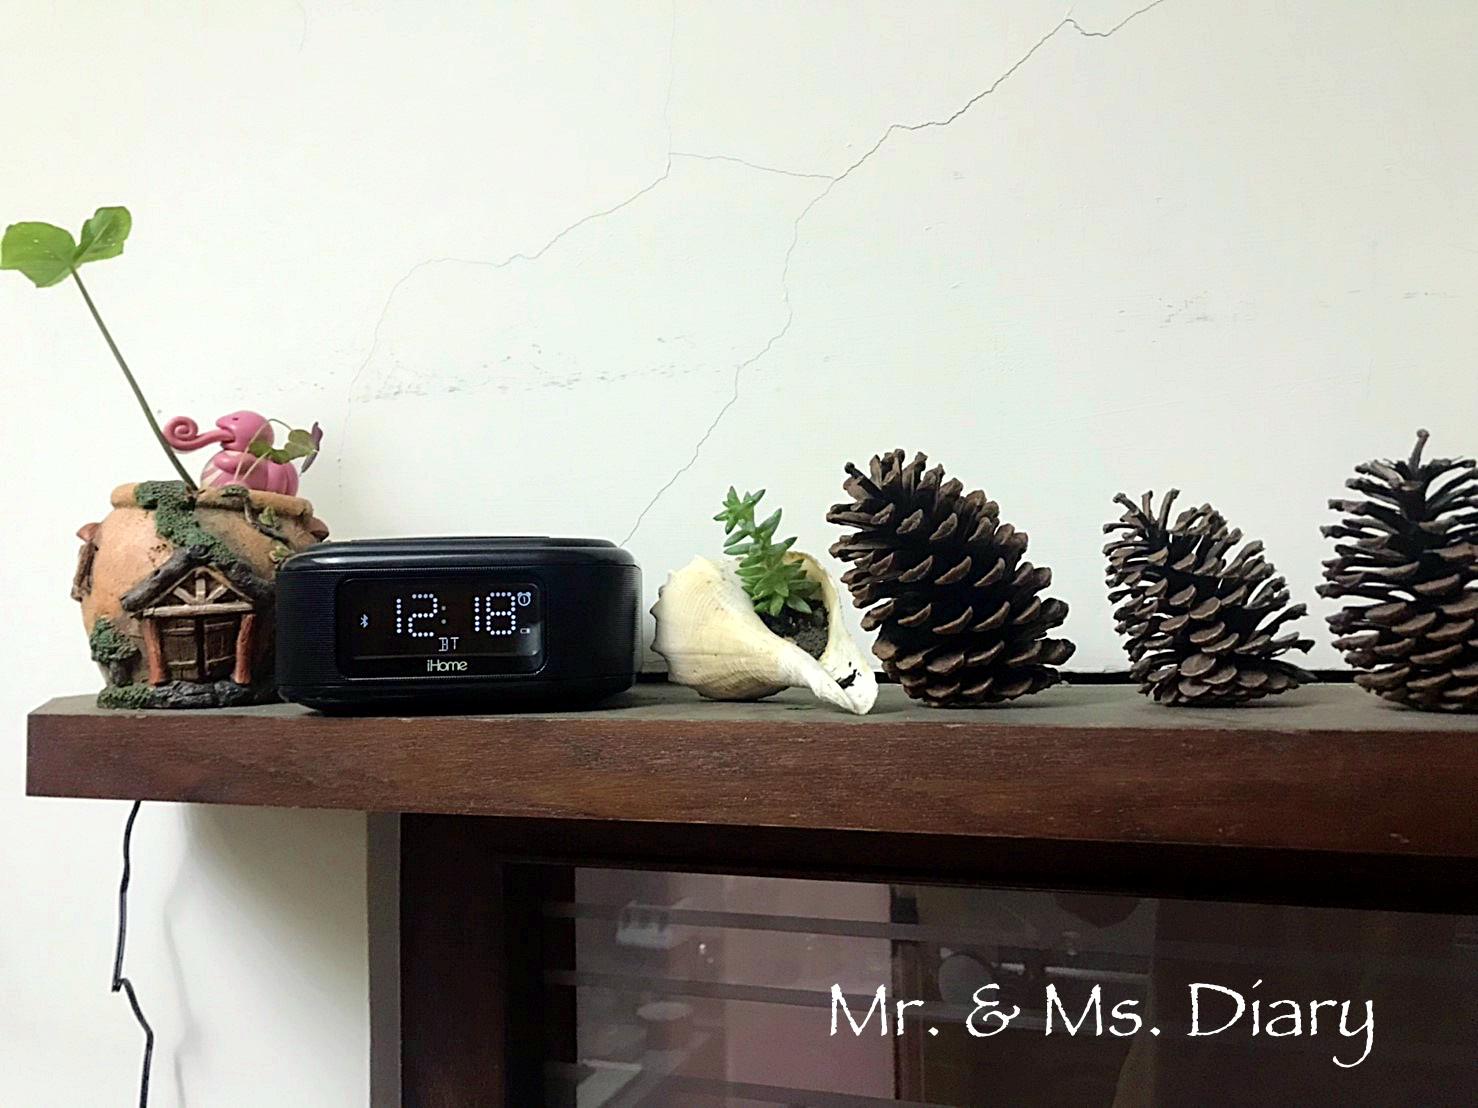 iHome 無線充電藍牙喇叭推薦!居家必備,音質溫暖清晰,雙鬧鐘設計,有效切換生活節奏